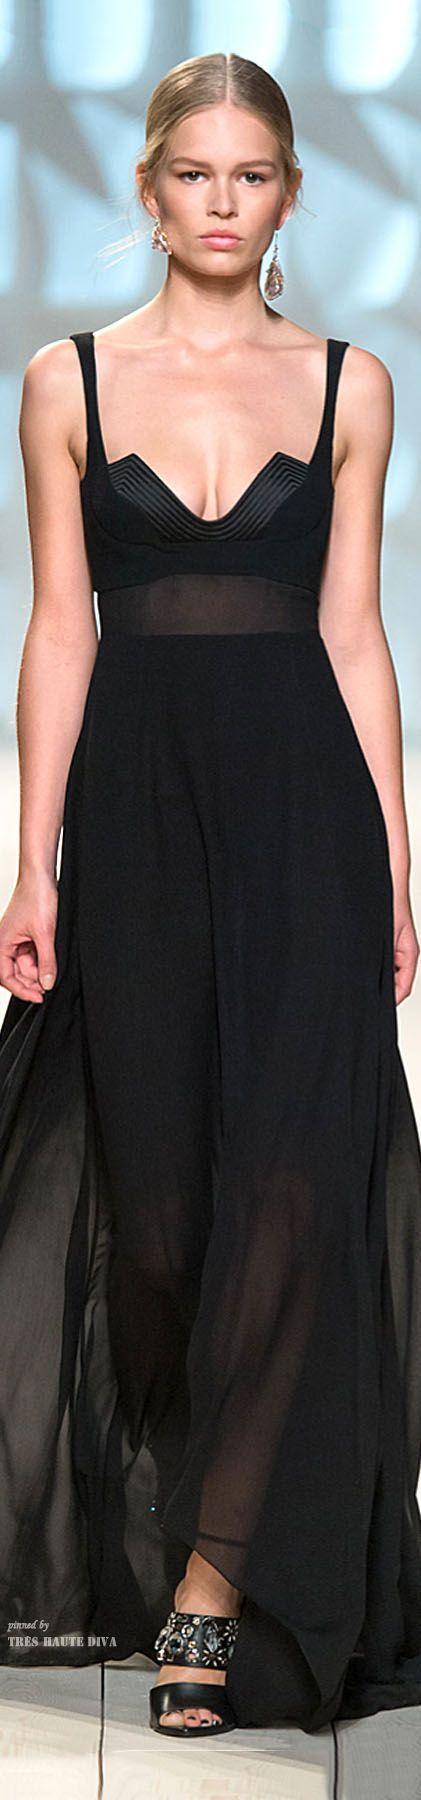 #Paris FW Nina Ricci Spring Summer 2015 RTW - underwear as outerwear